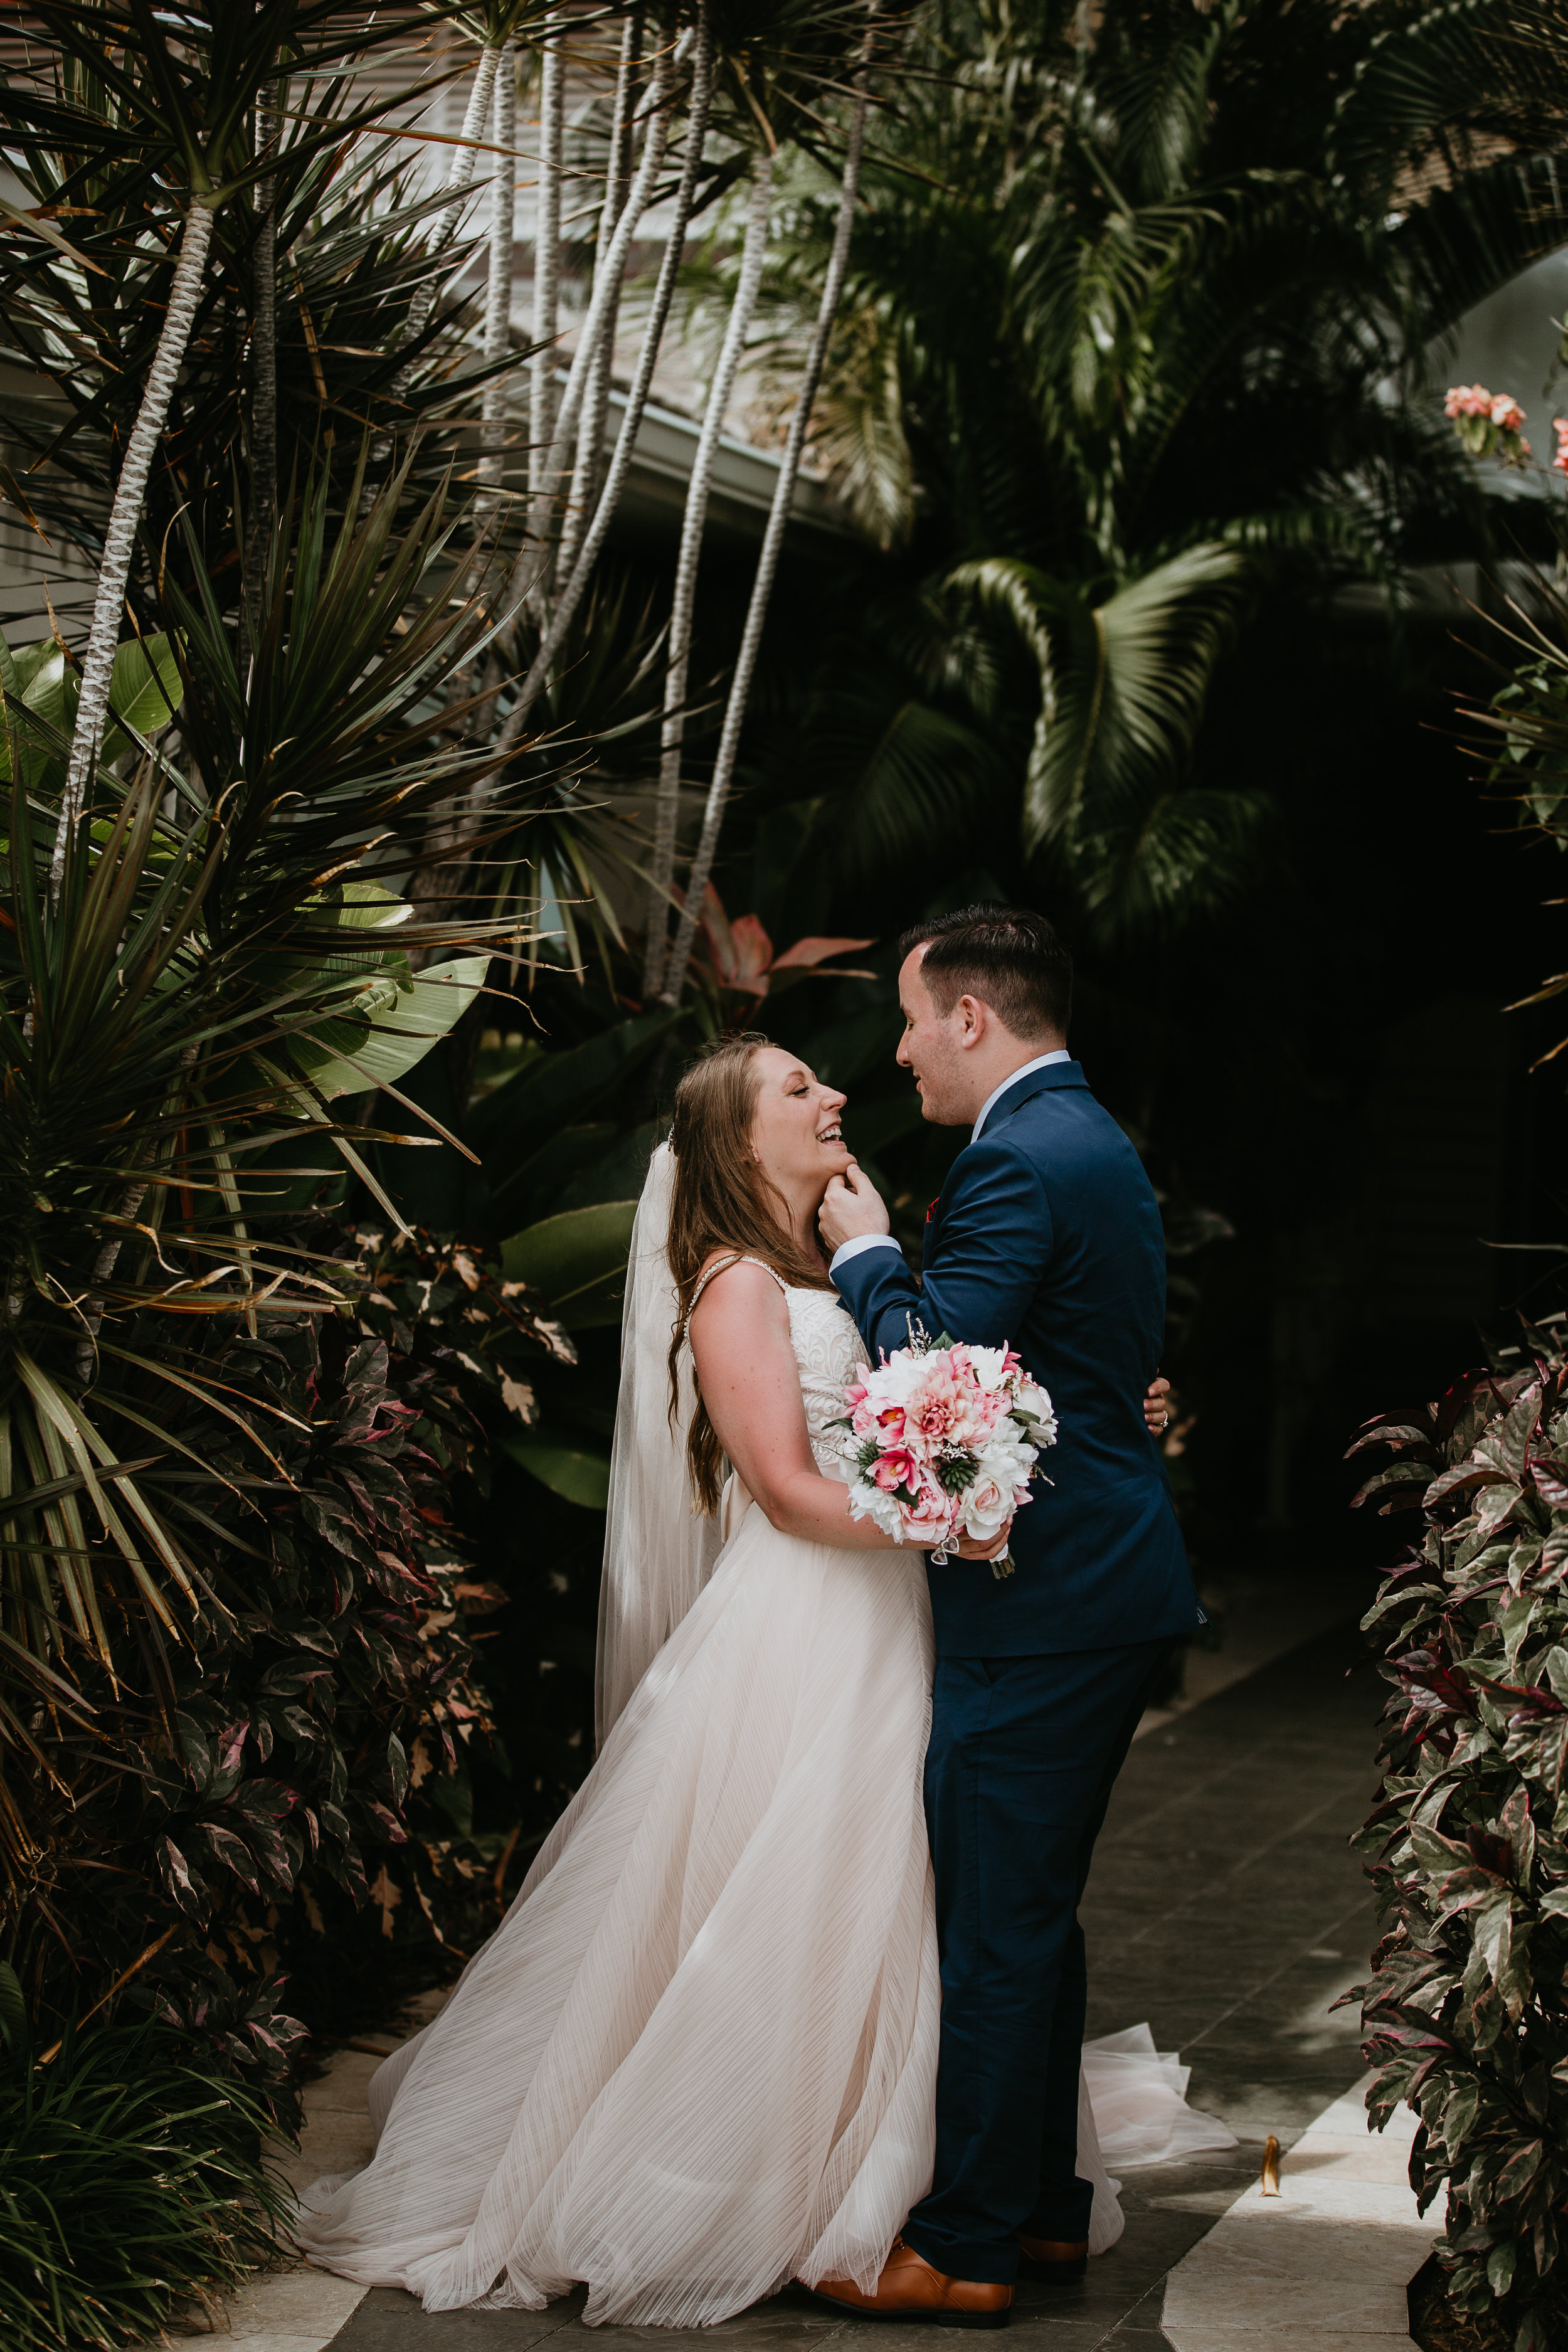 nicole-daacke-photography-destination-wedding-in-st-lucia-sandals-la-toc-intimate-island-wedding-carribean-elopement-photographer-chill-island-wedding-43.jpg